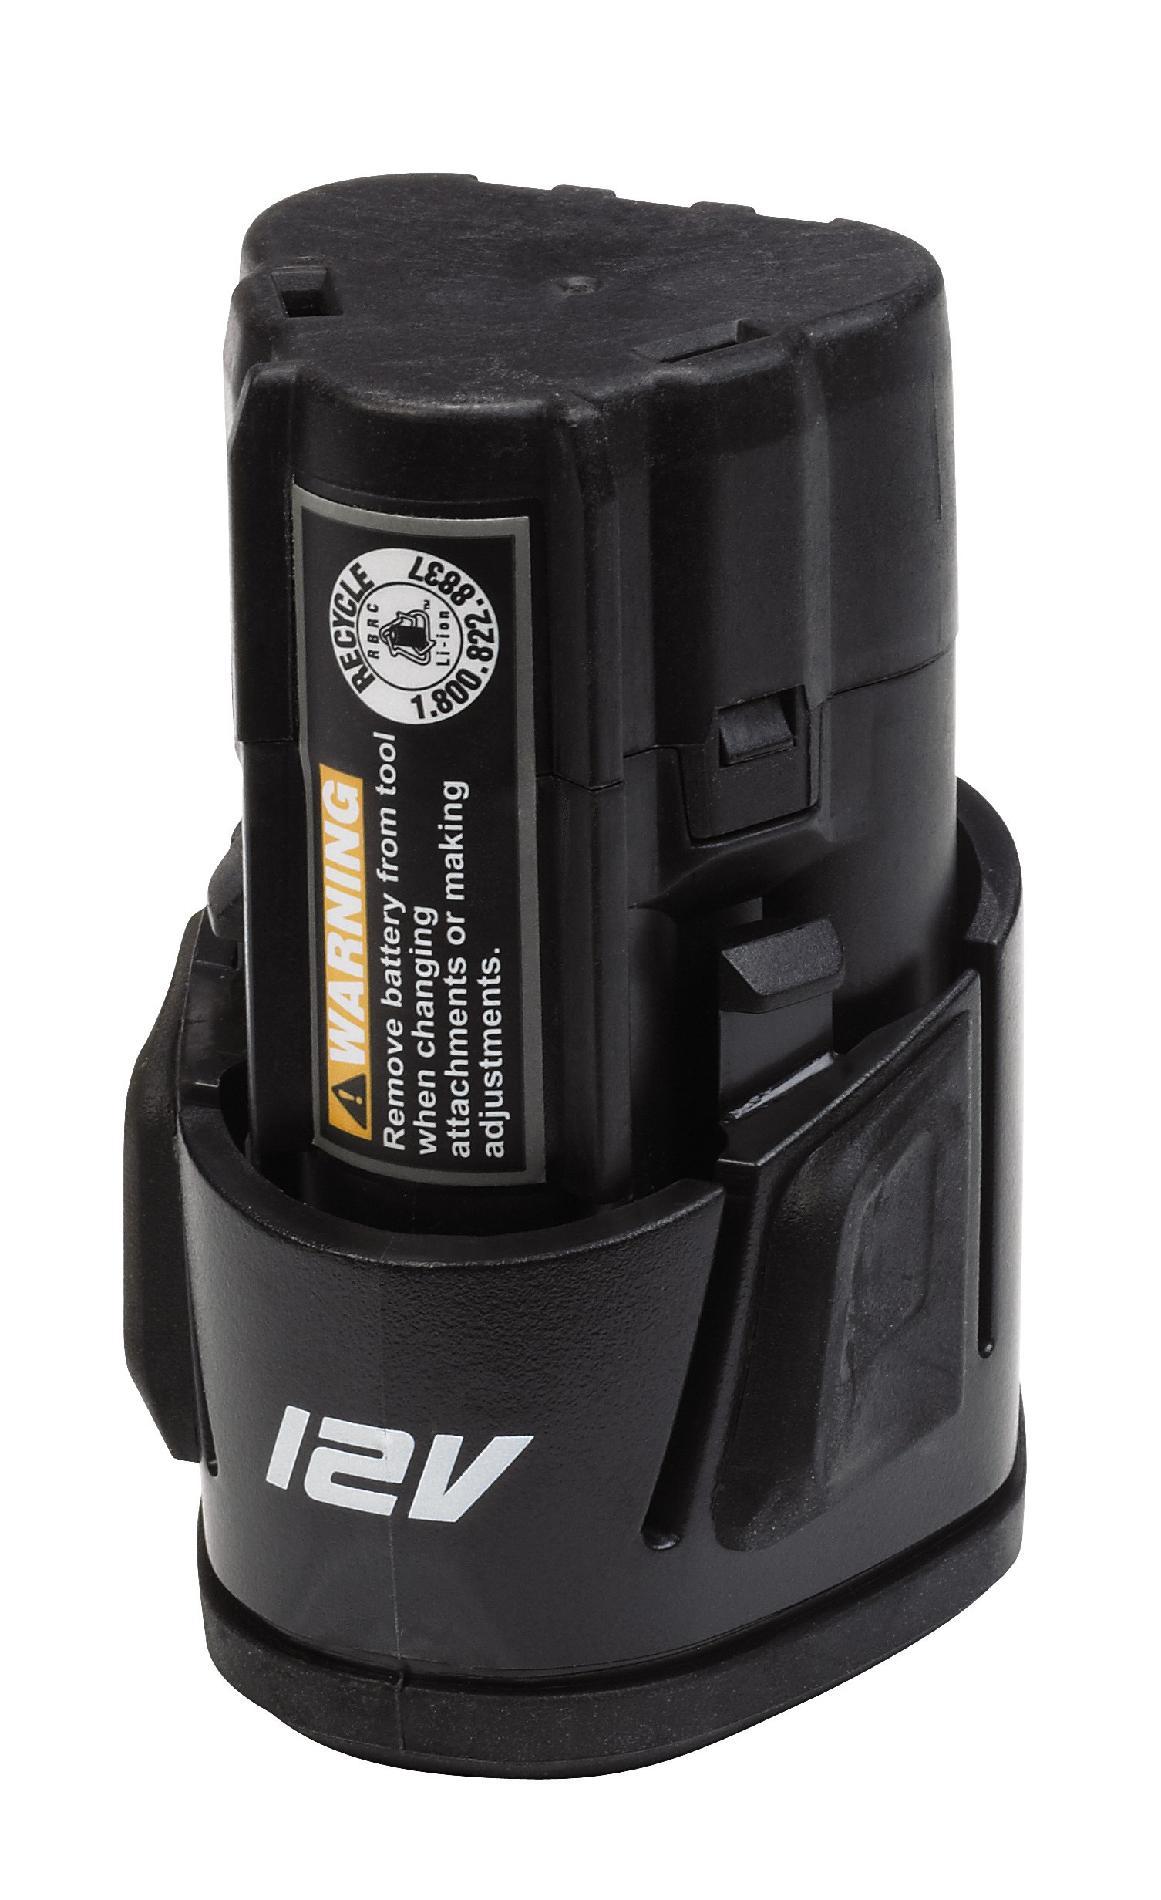 Craftsman 12 Volt Nextec Compact Lithium-Ion battery